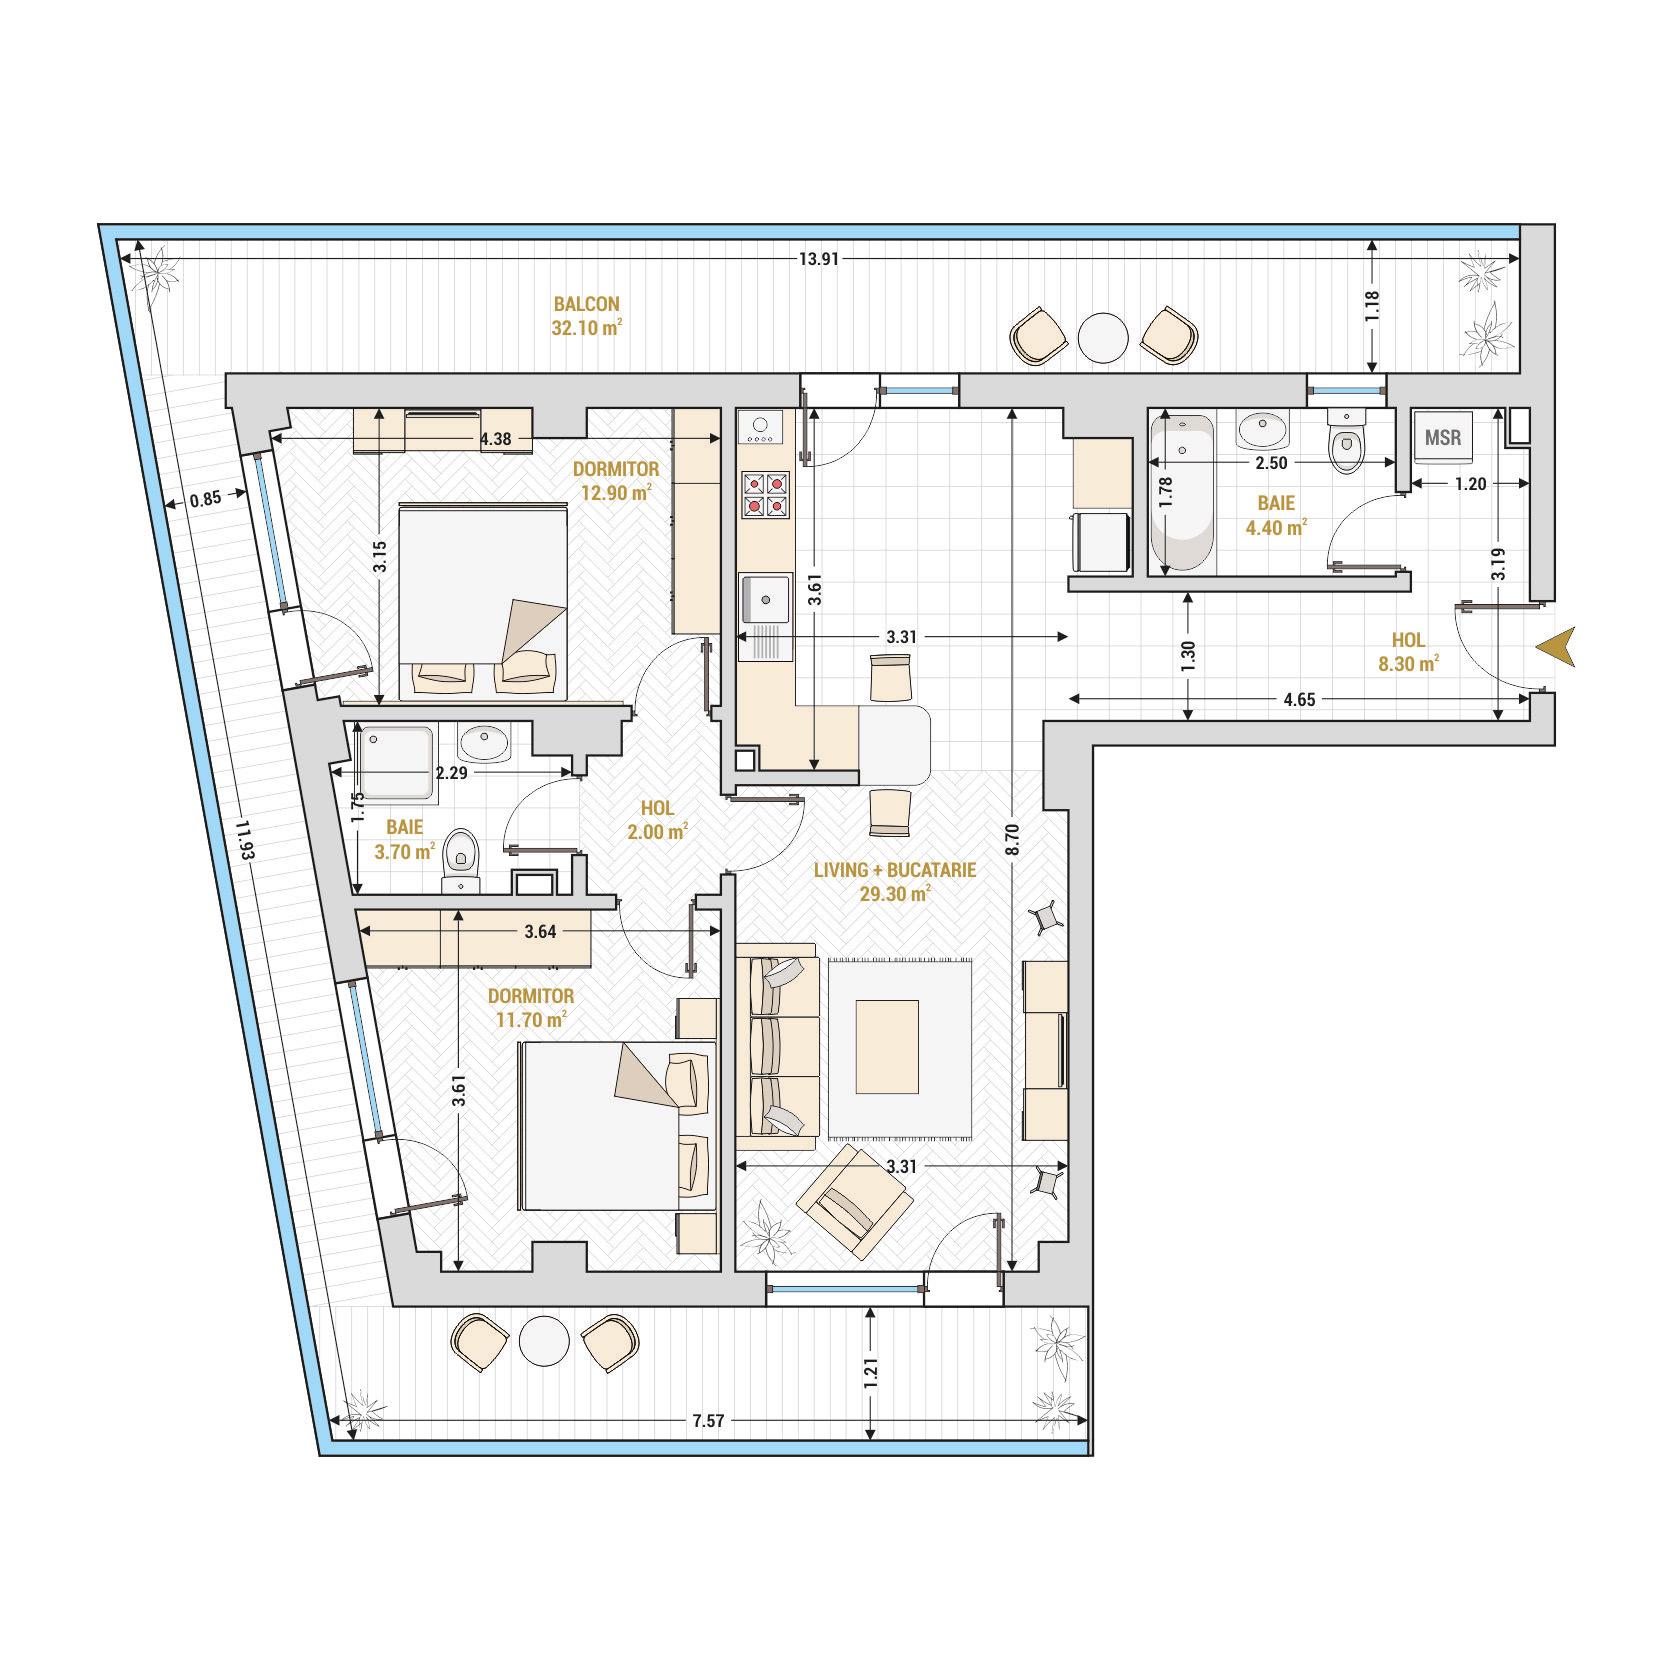 Apartamente cu 3 camere Bucuresti - Catedral Residence - Marriott, Piata Unirii, 13 Septembrie, Izvor - Suprafata utila totala - 104.40 mp